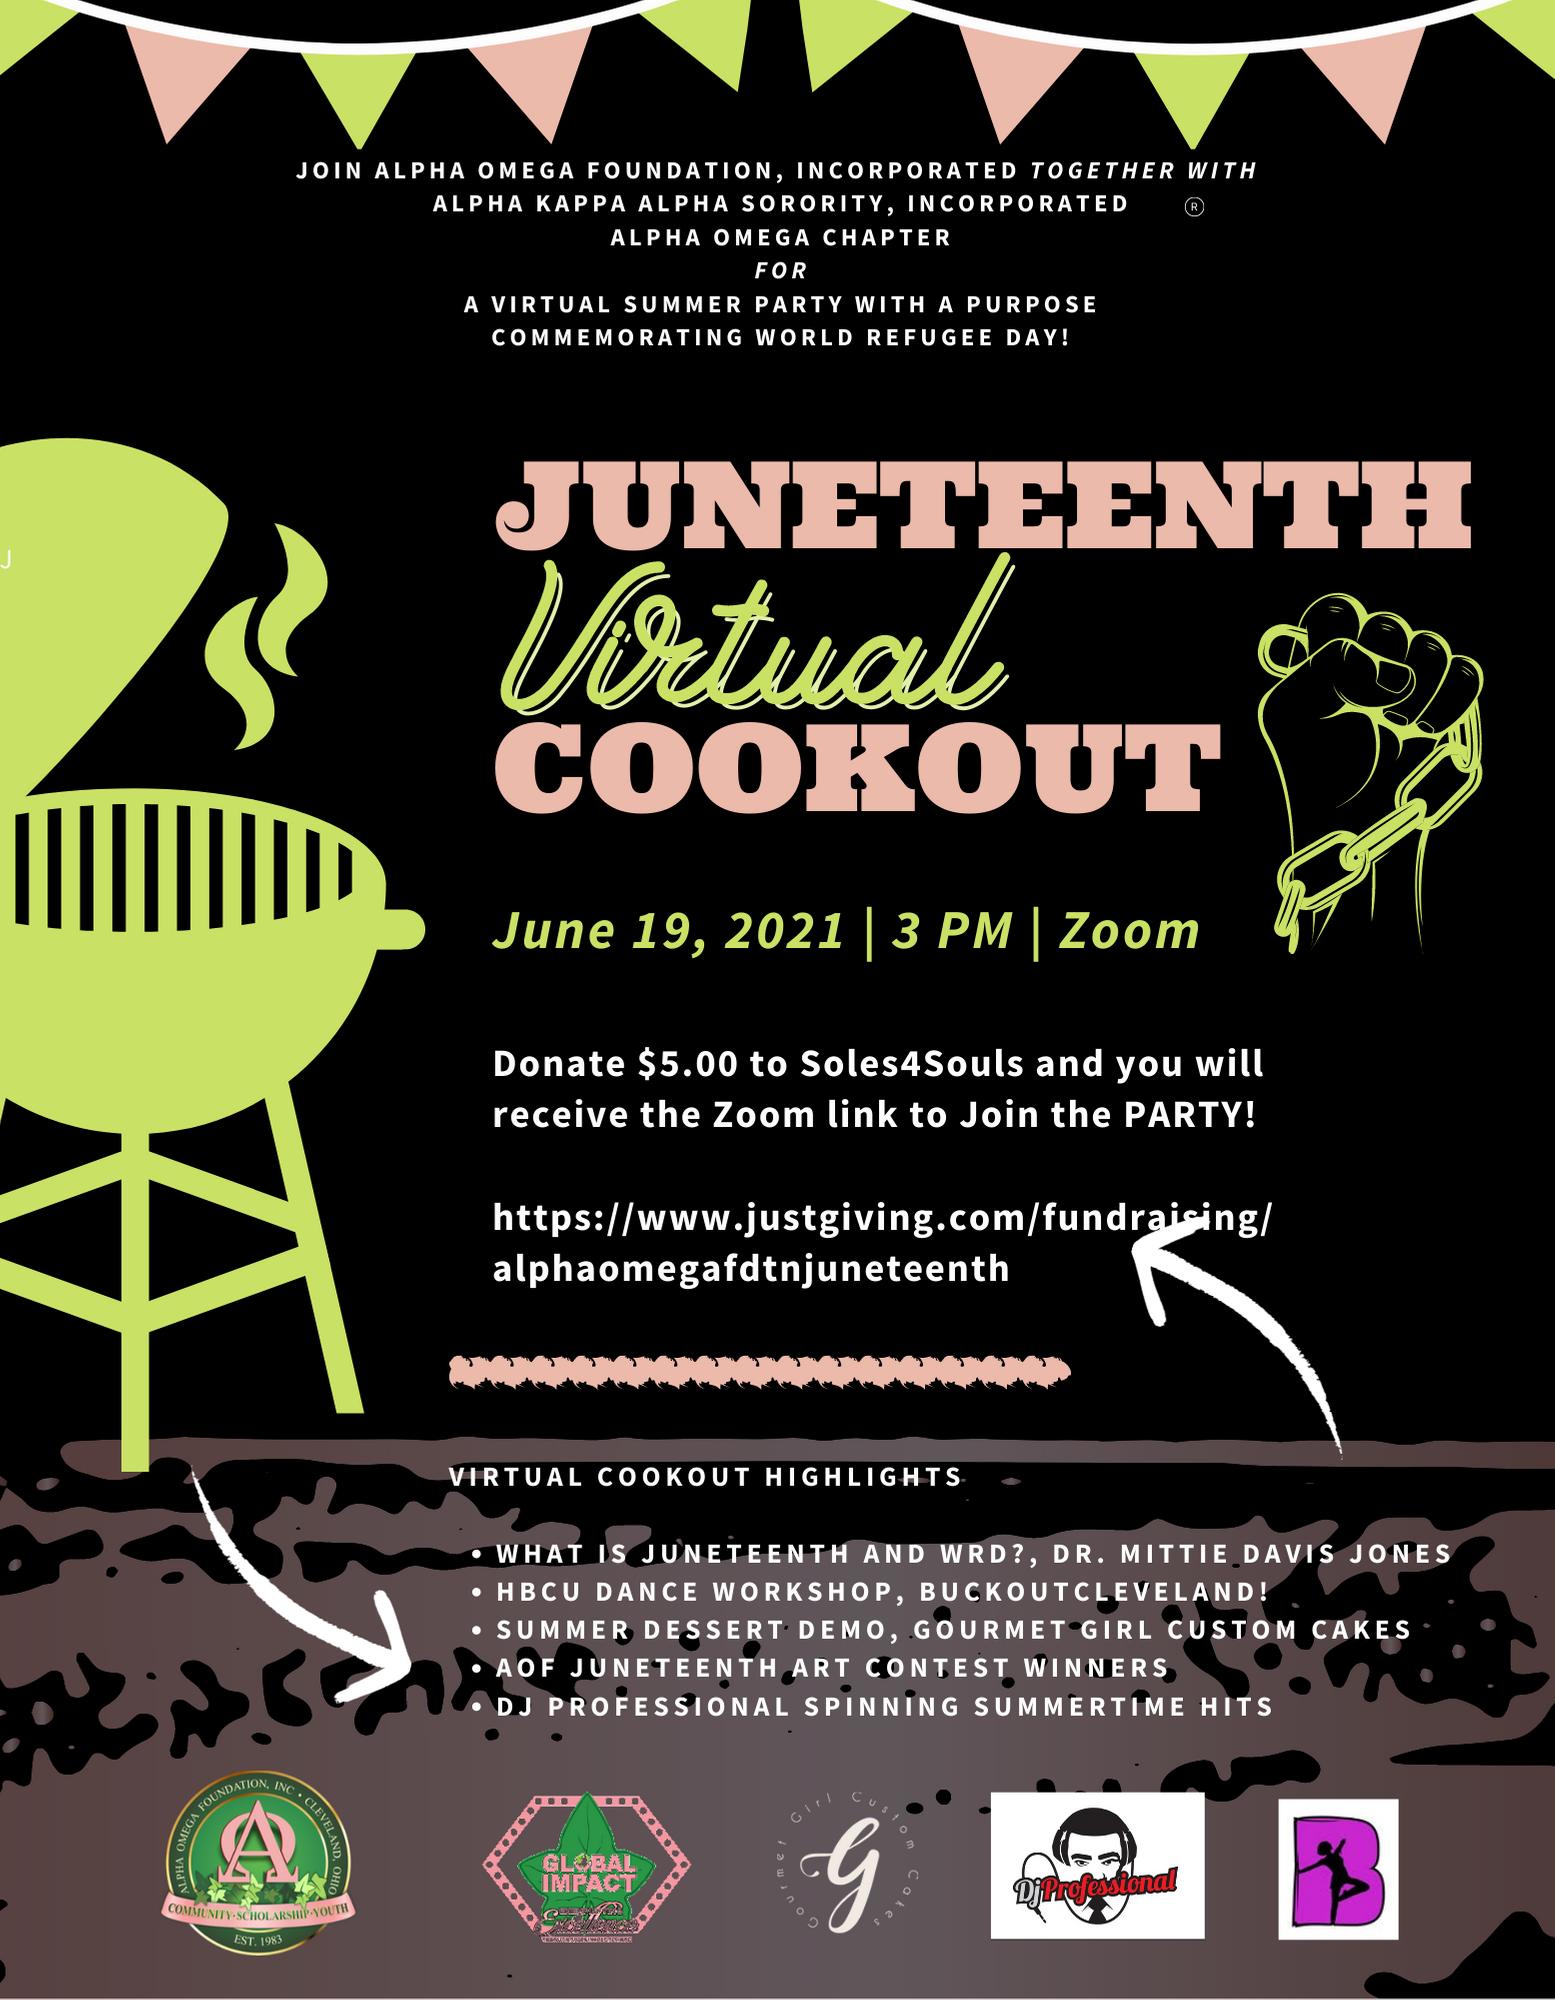 Juneteenth virtual cookout